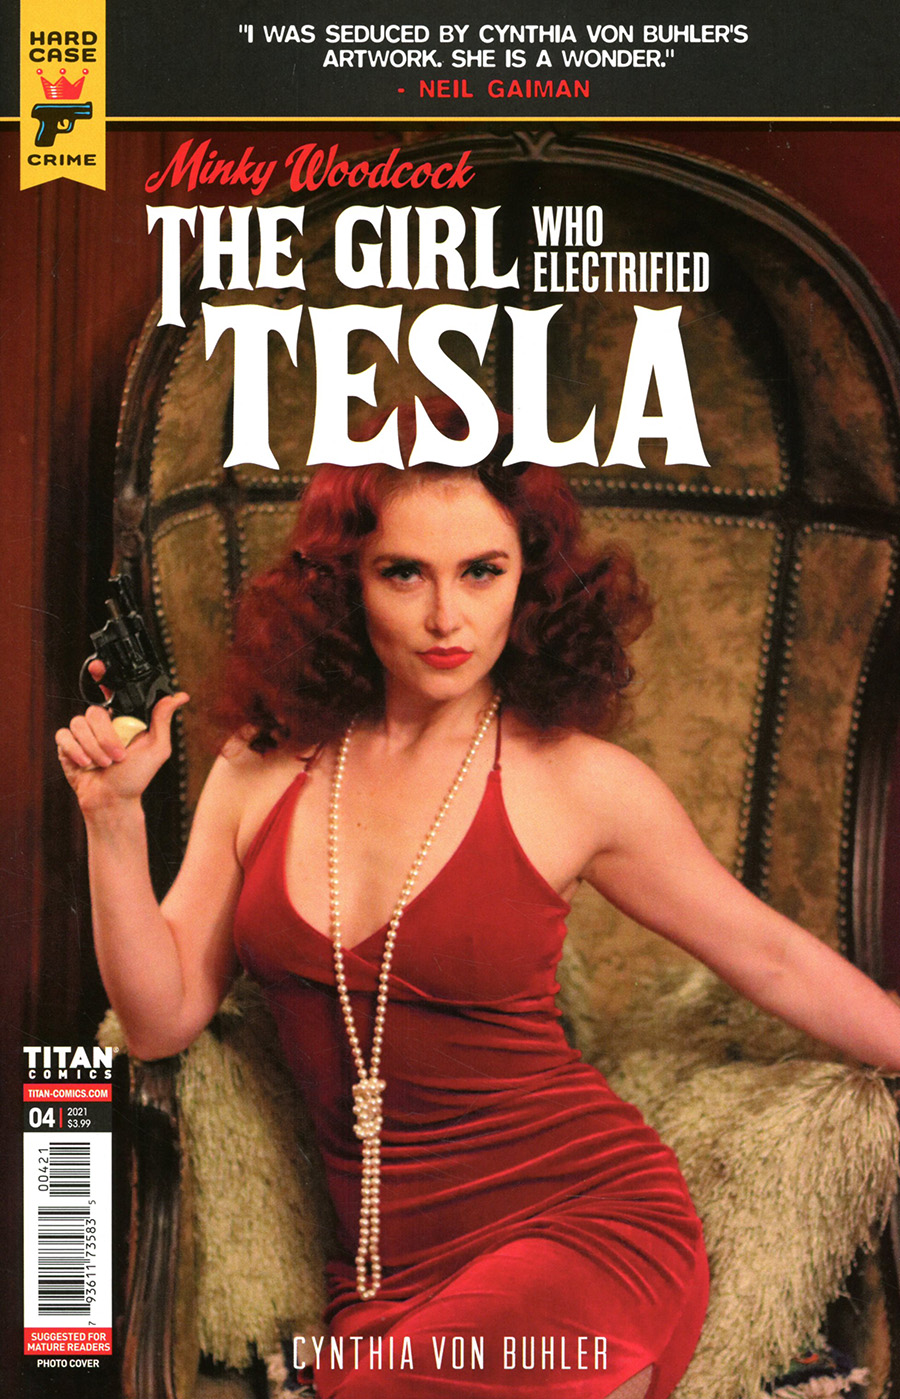 Hard Case Crime Minky Woodcock Girl Who Electrified Tesla #4 Cover B Variant Photo Cover